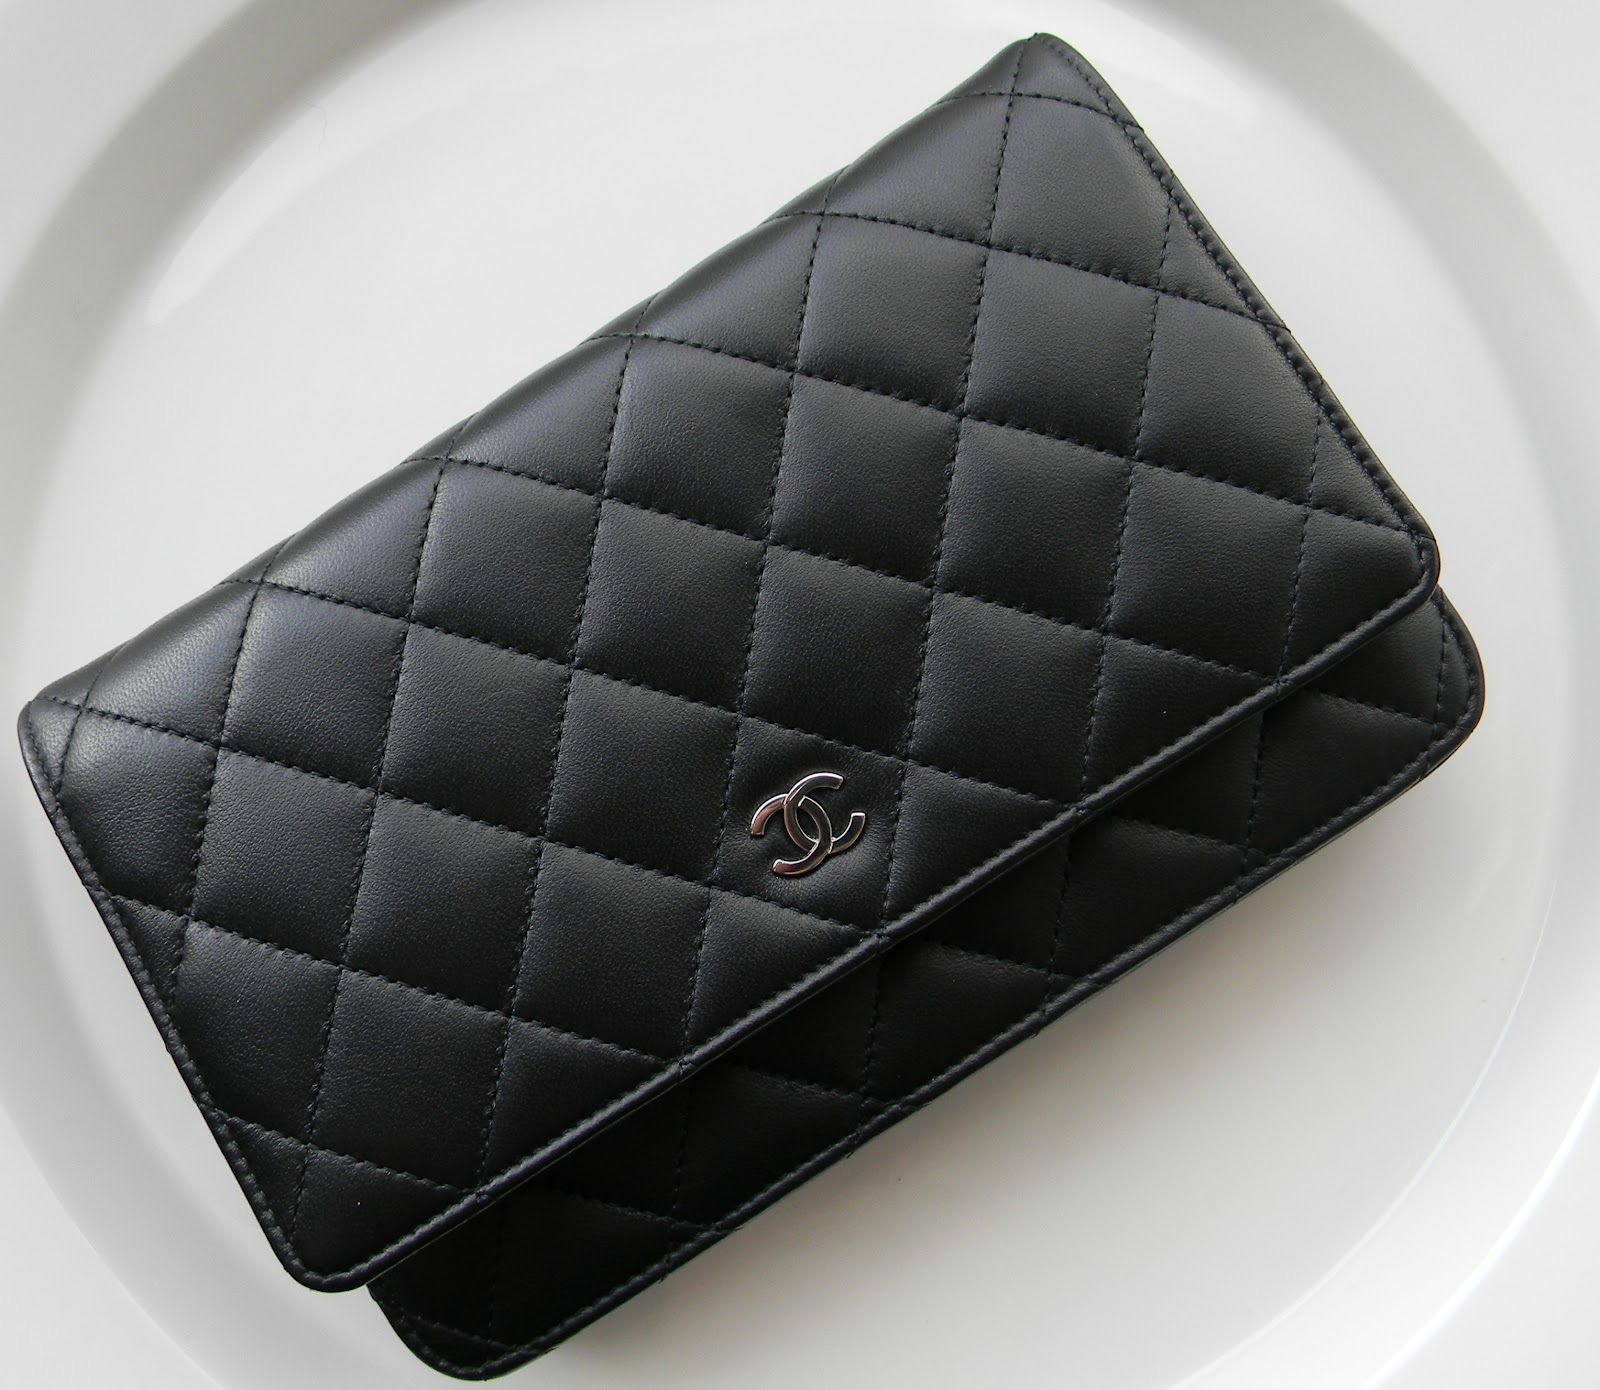 Ostetaan Chanel Laukku : Puuvillankukkia chanel woc inside